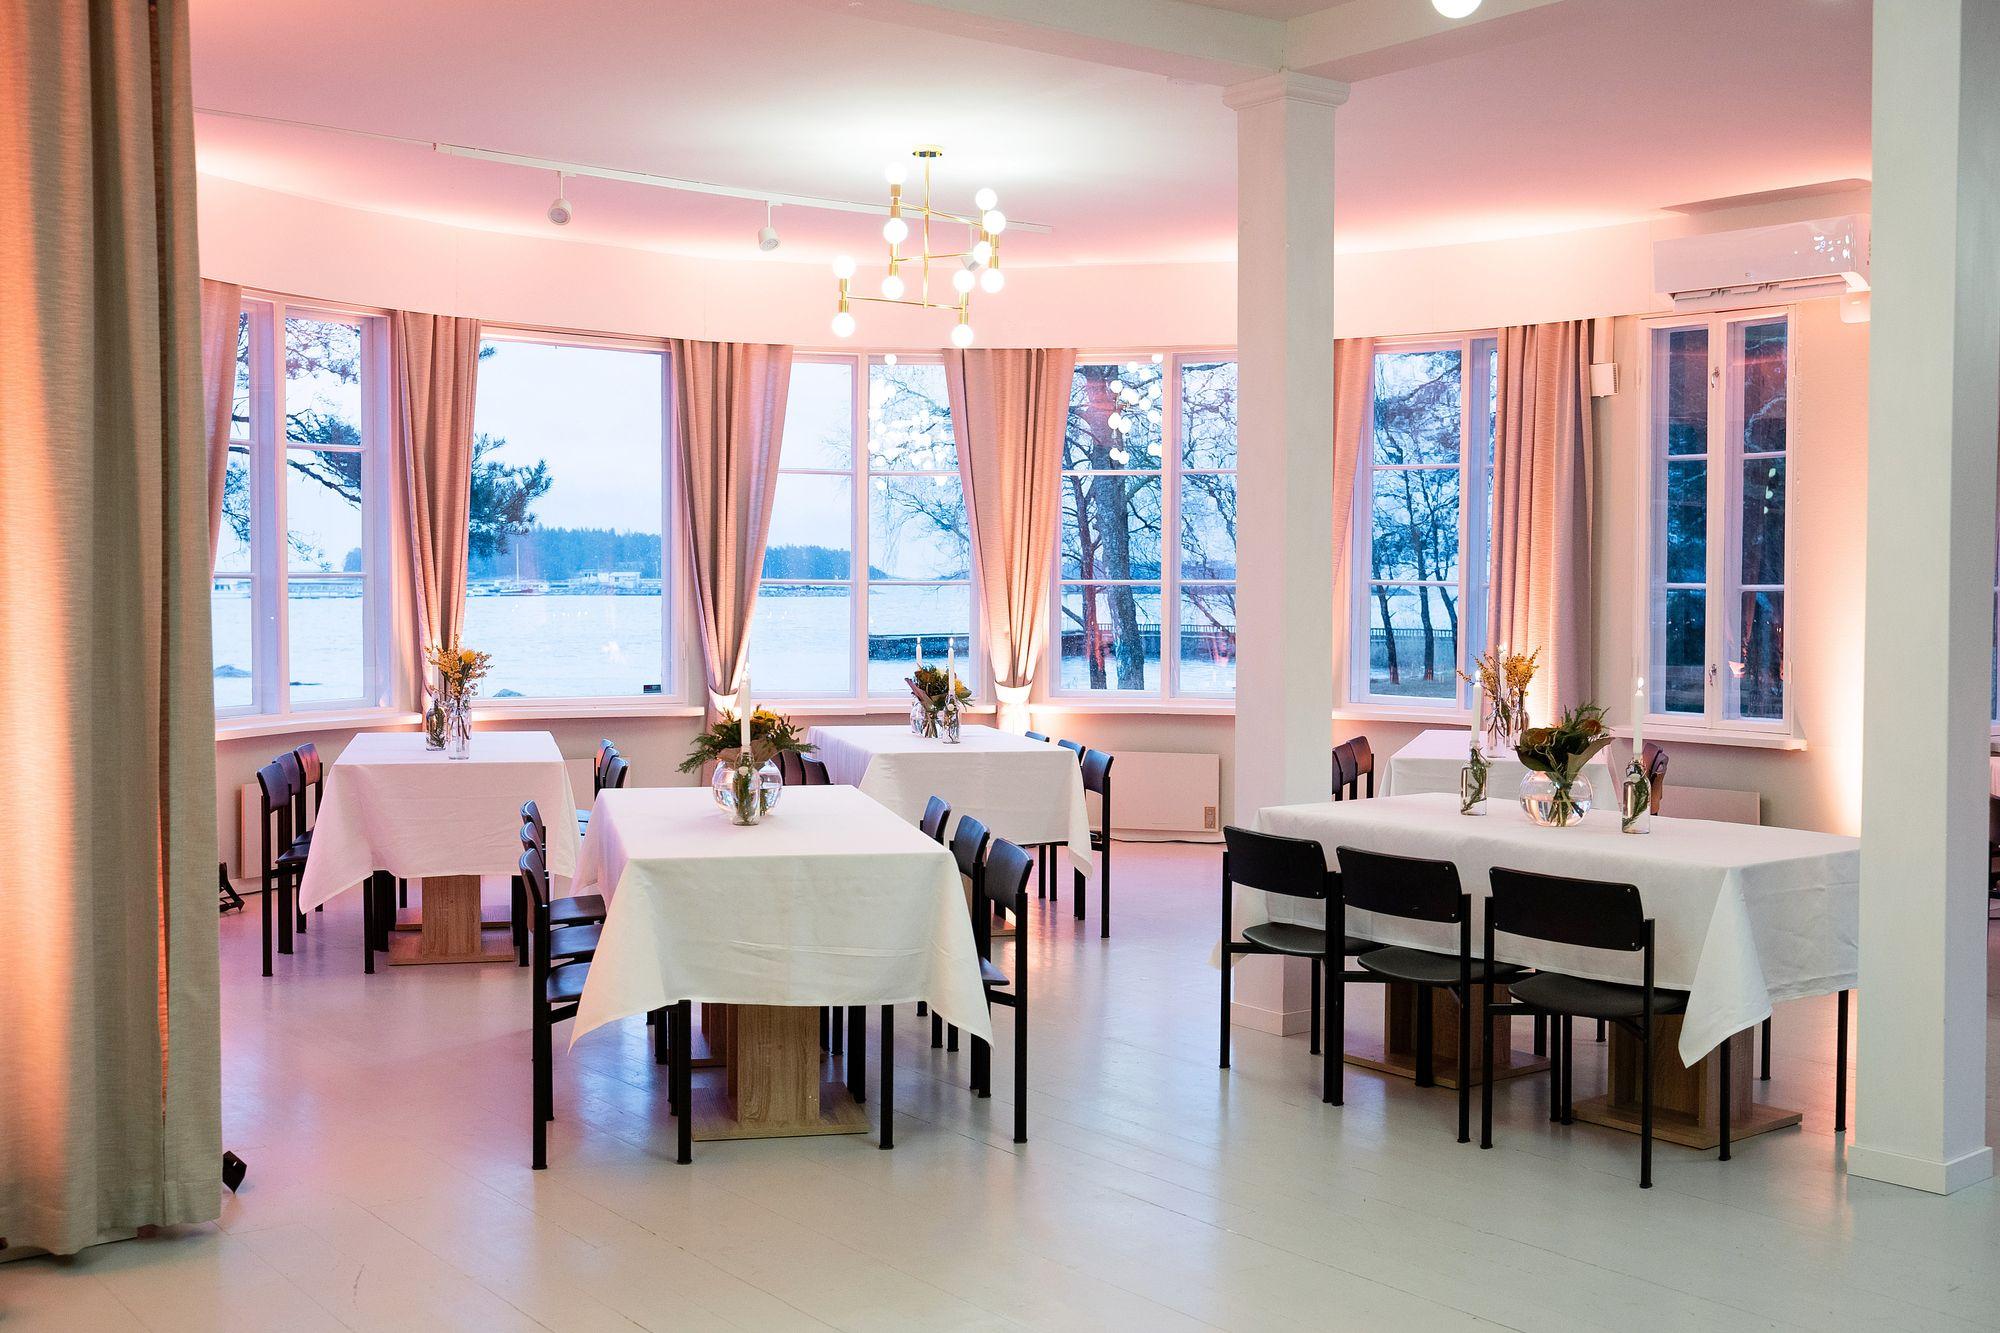 Villa Ivan Falin - tila rapujuhliin / Venuu.fi